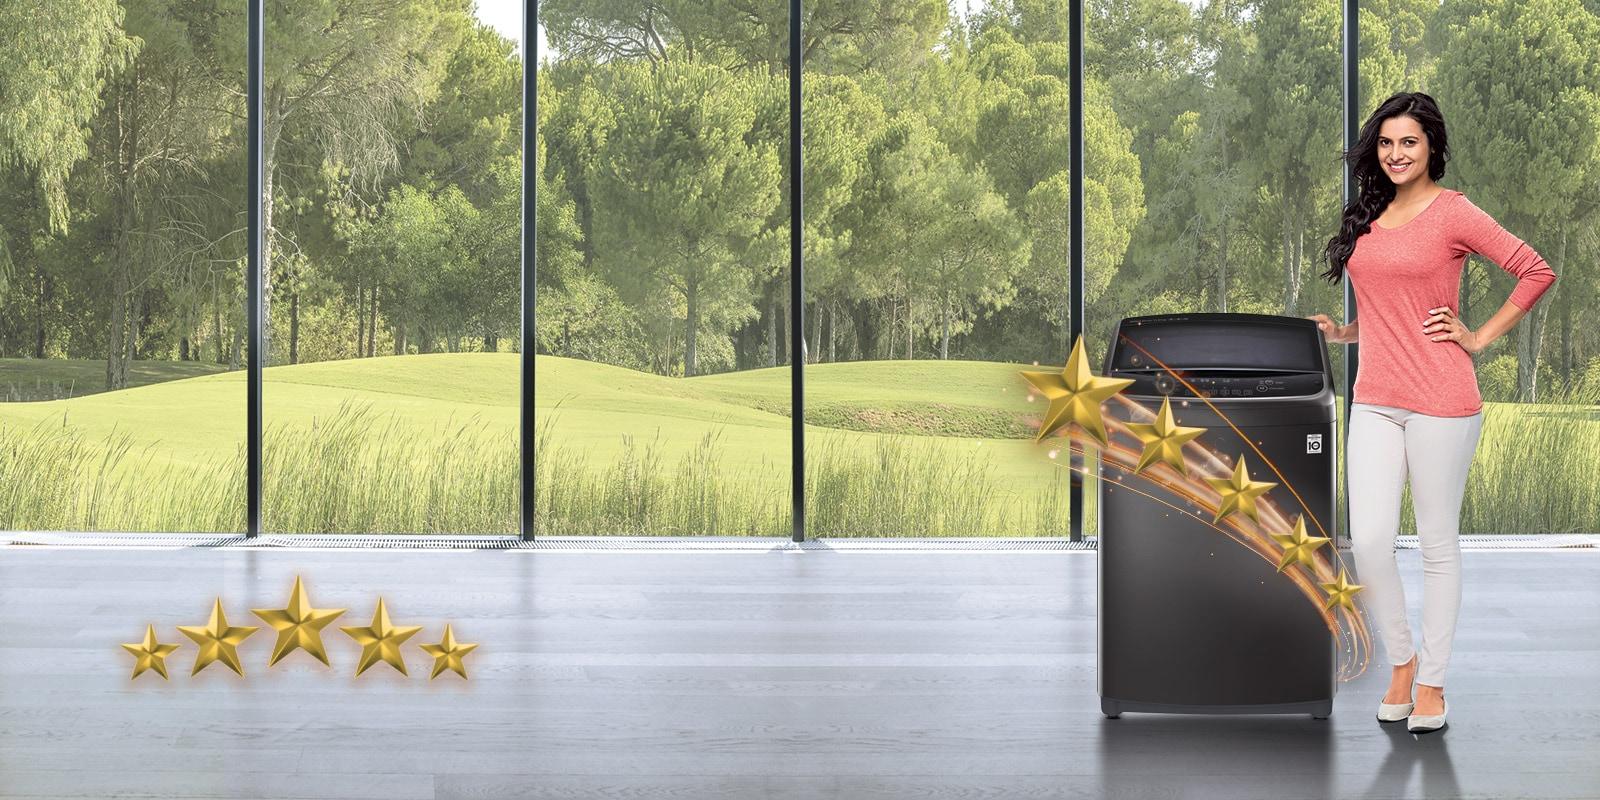 LG T70SJMB1Z 7.0 kg 5 STAR RATING